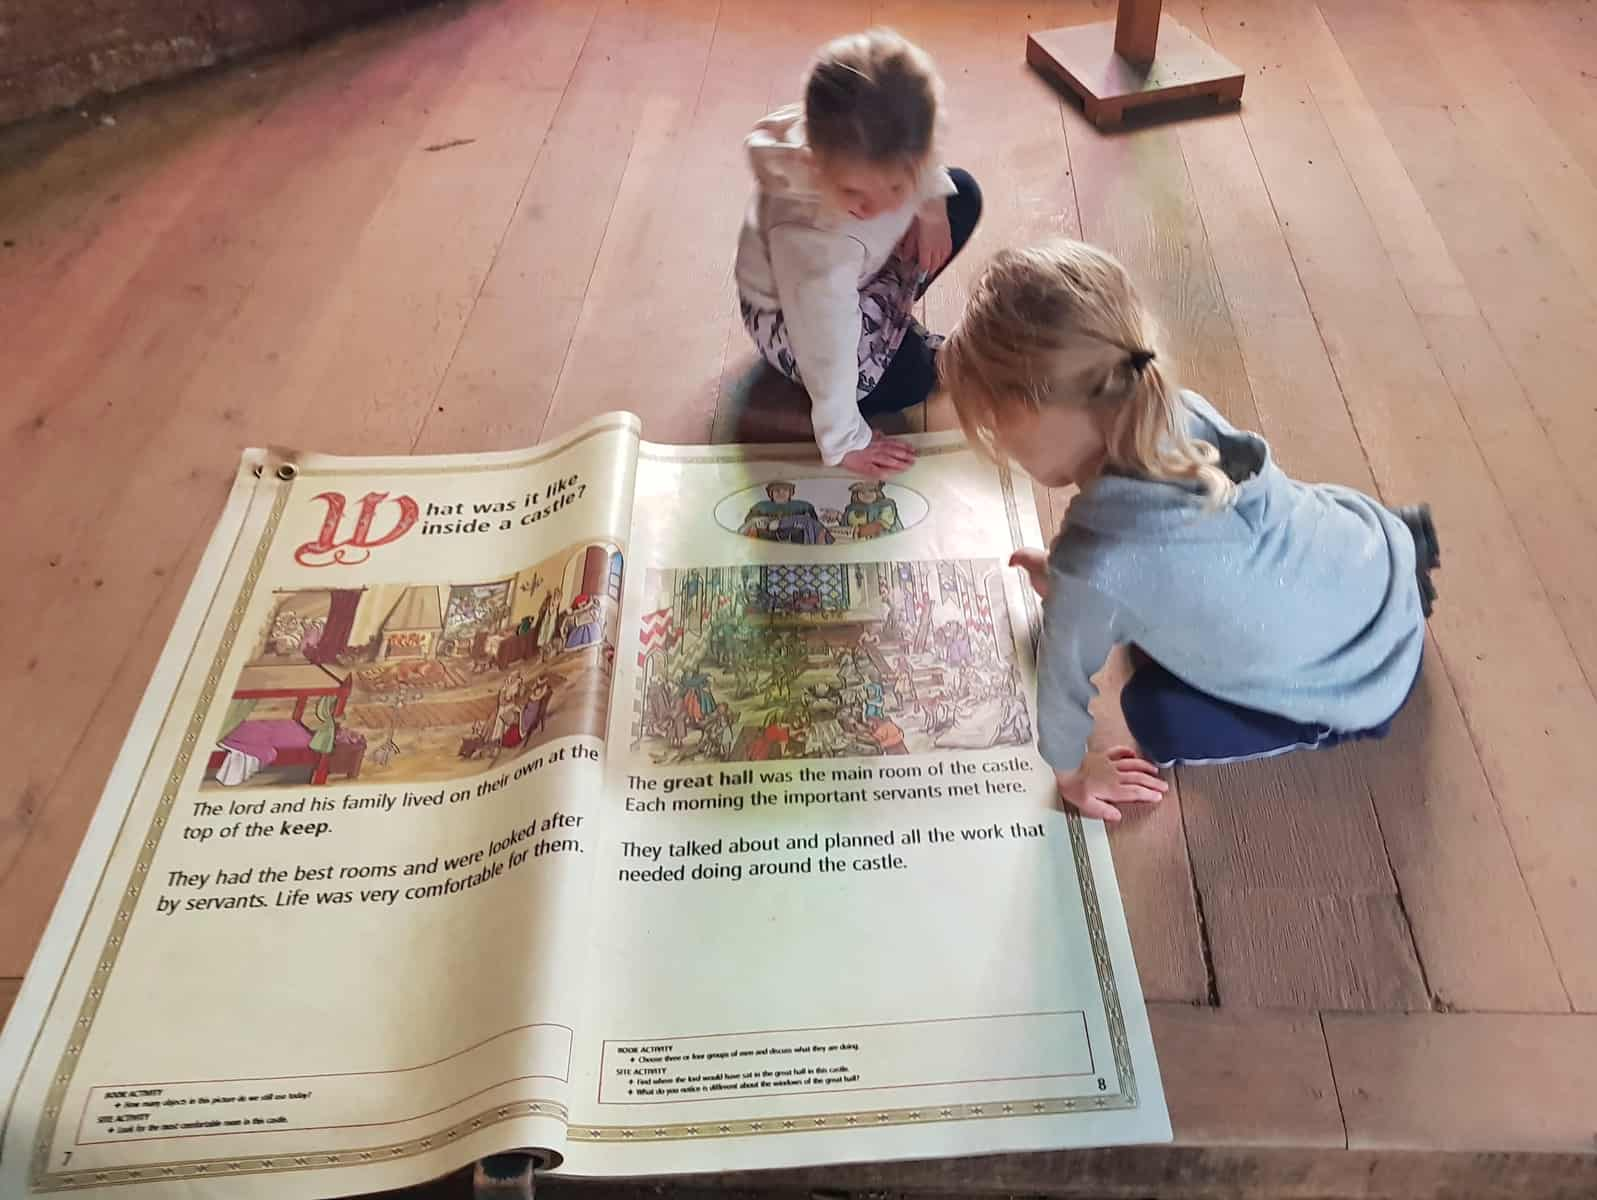 Children reading an oversized book